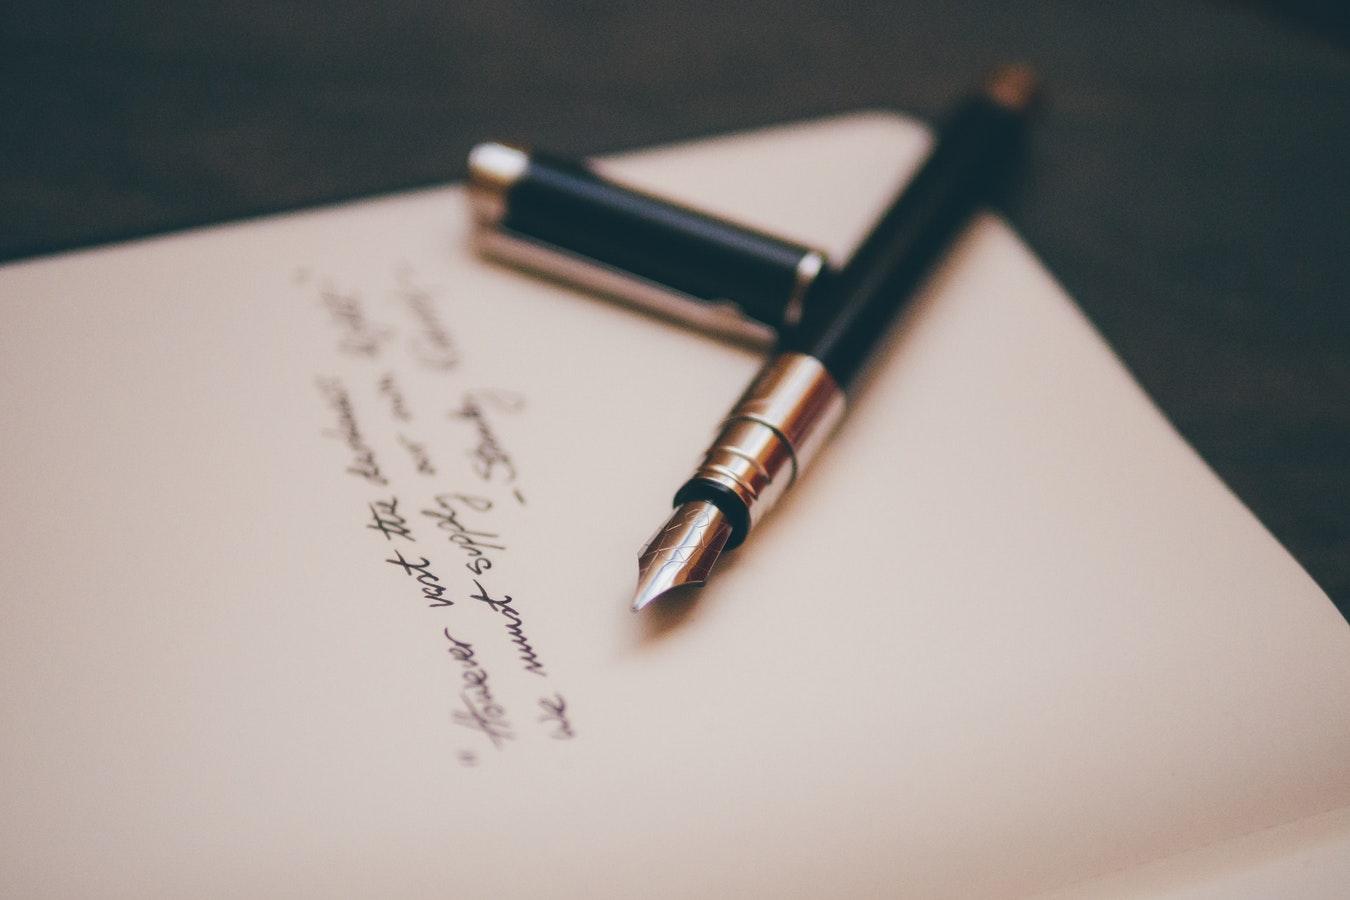 Top 10 Beste Nederlandse Dichtbundels & Dichters [Update 2020]